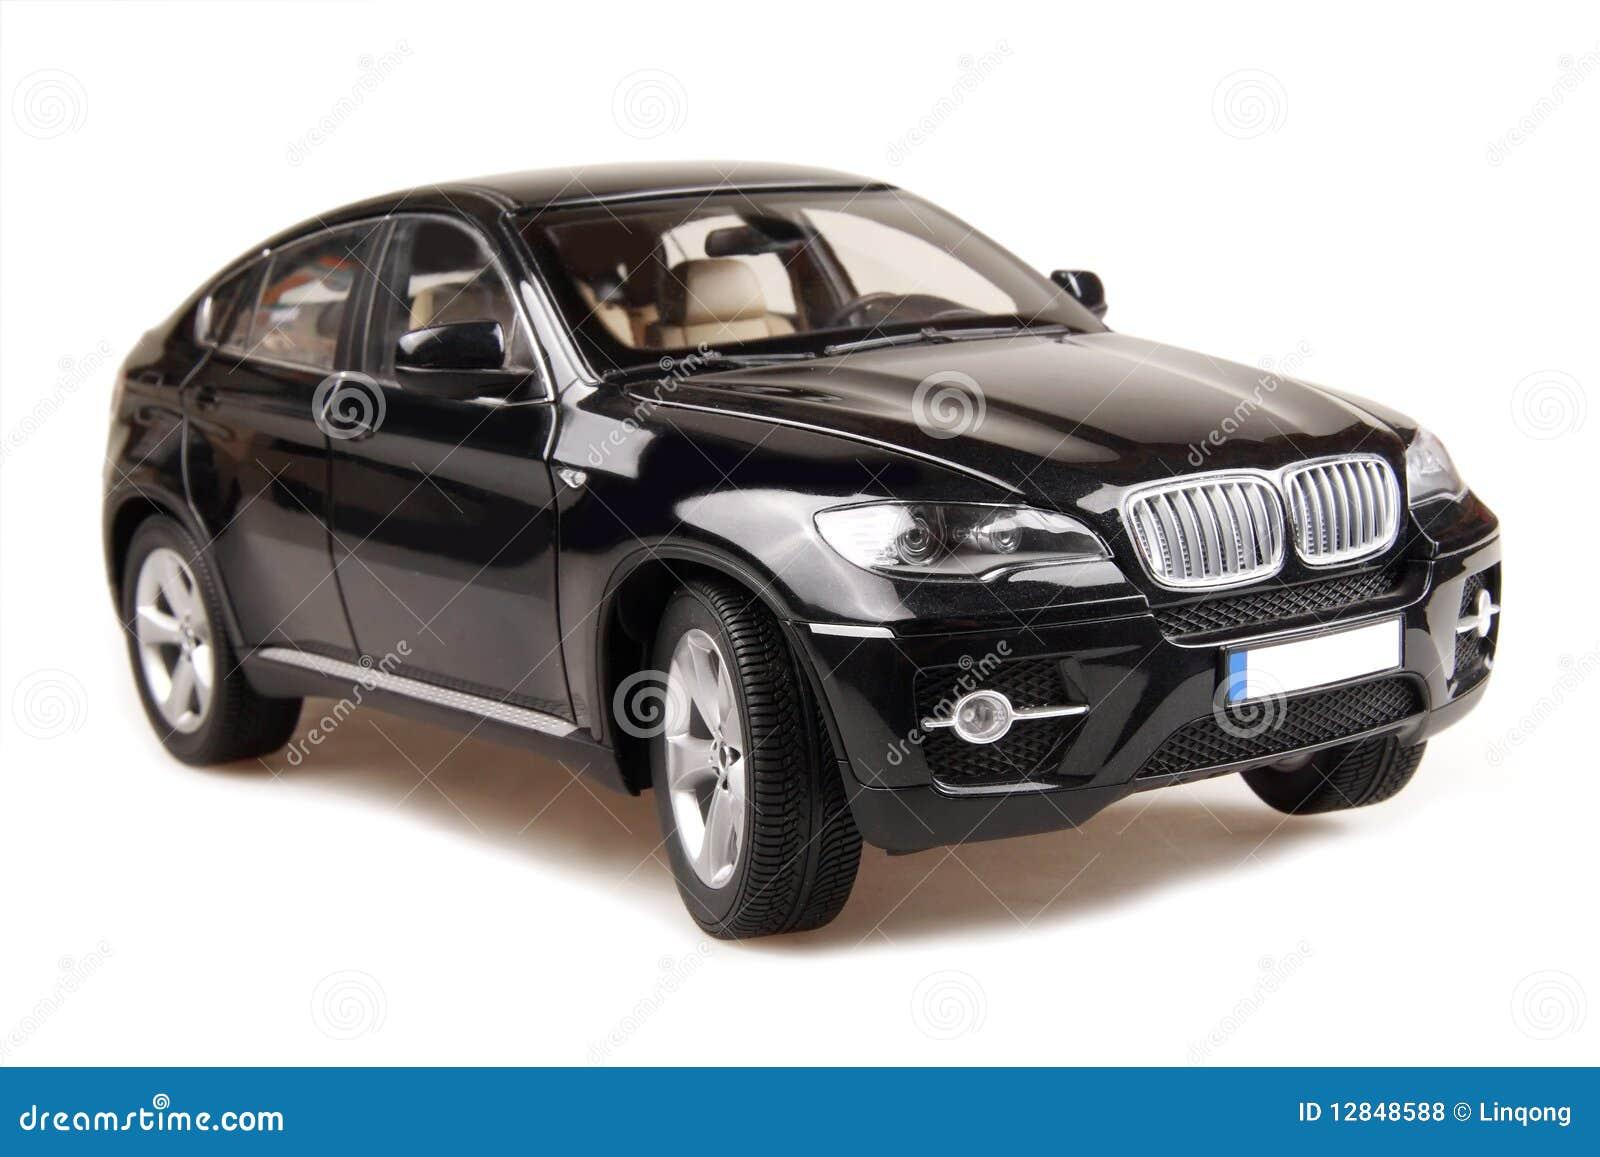 Bmw Suv Car Royalty Free Stock Photos Image 12848588